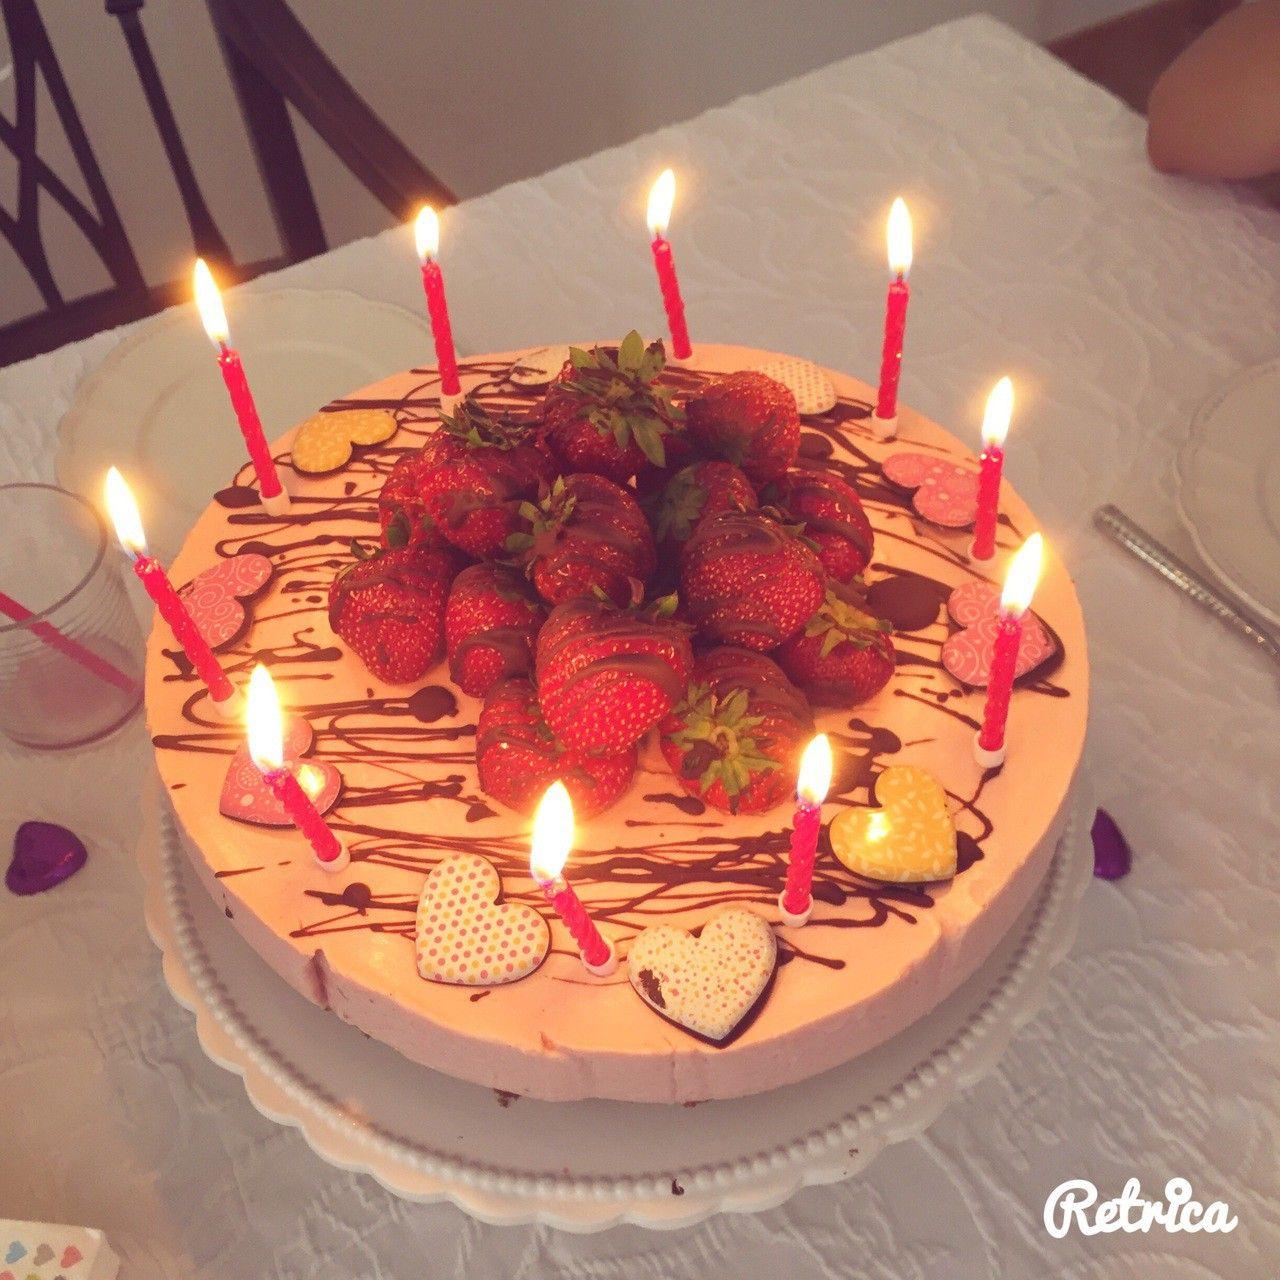 Pinterest cutipieanu Birthday blast, Birthday candles